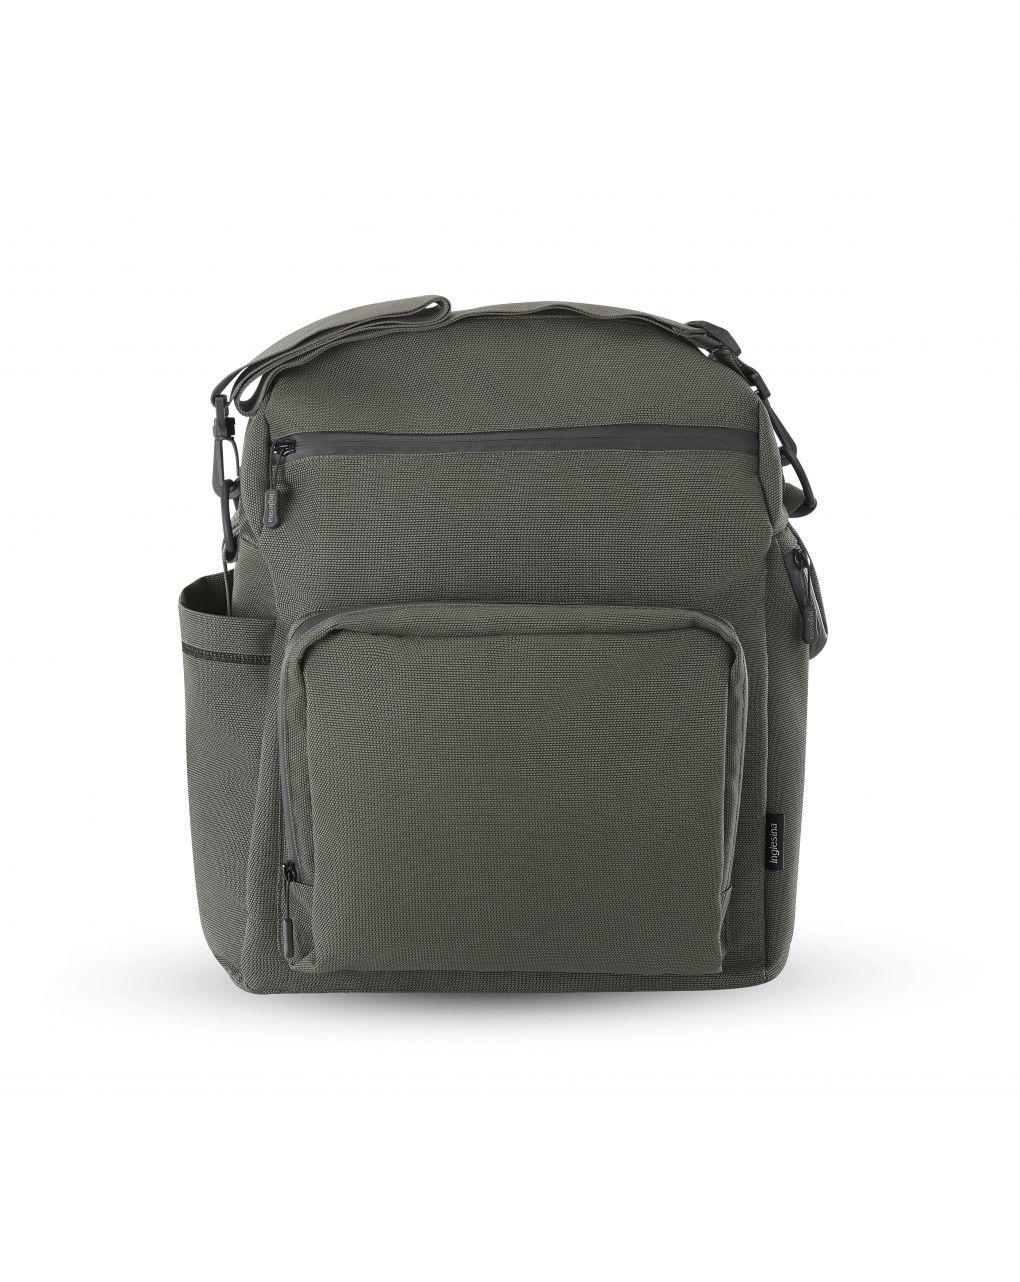 Inglesina aptica xt adventure bag, sequoia green - Inglesina